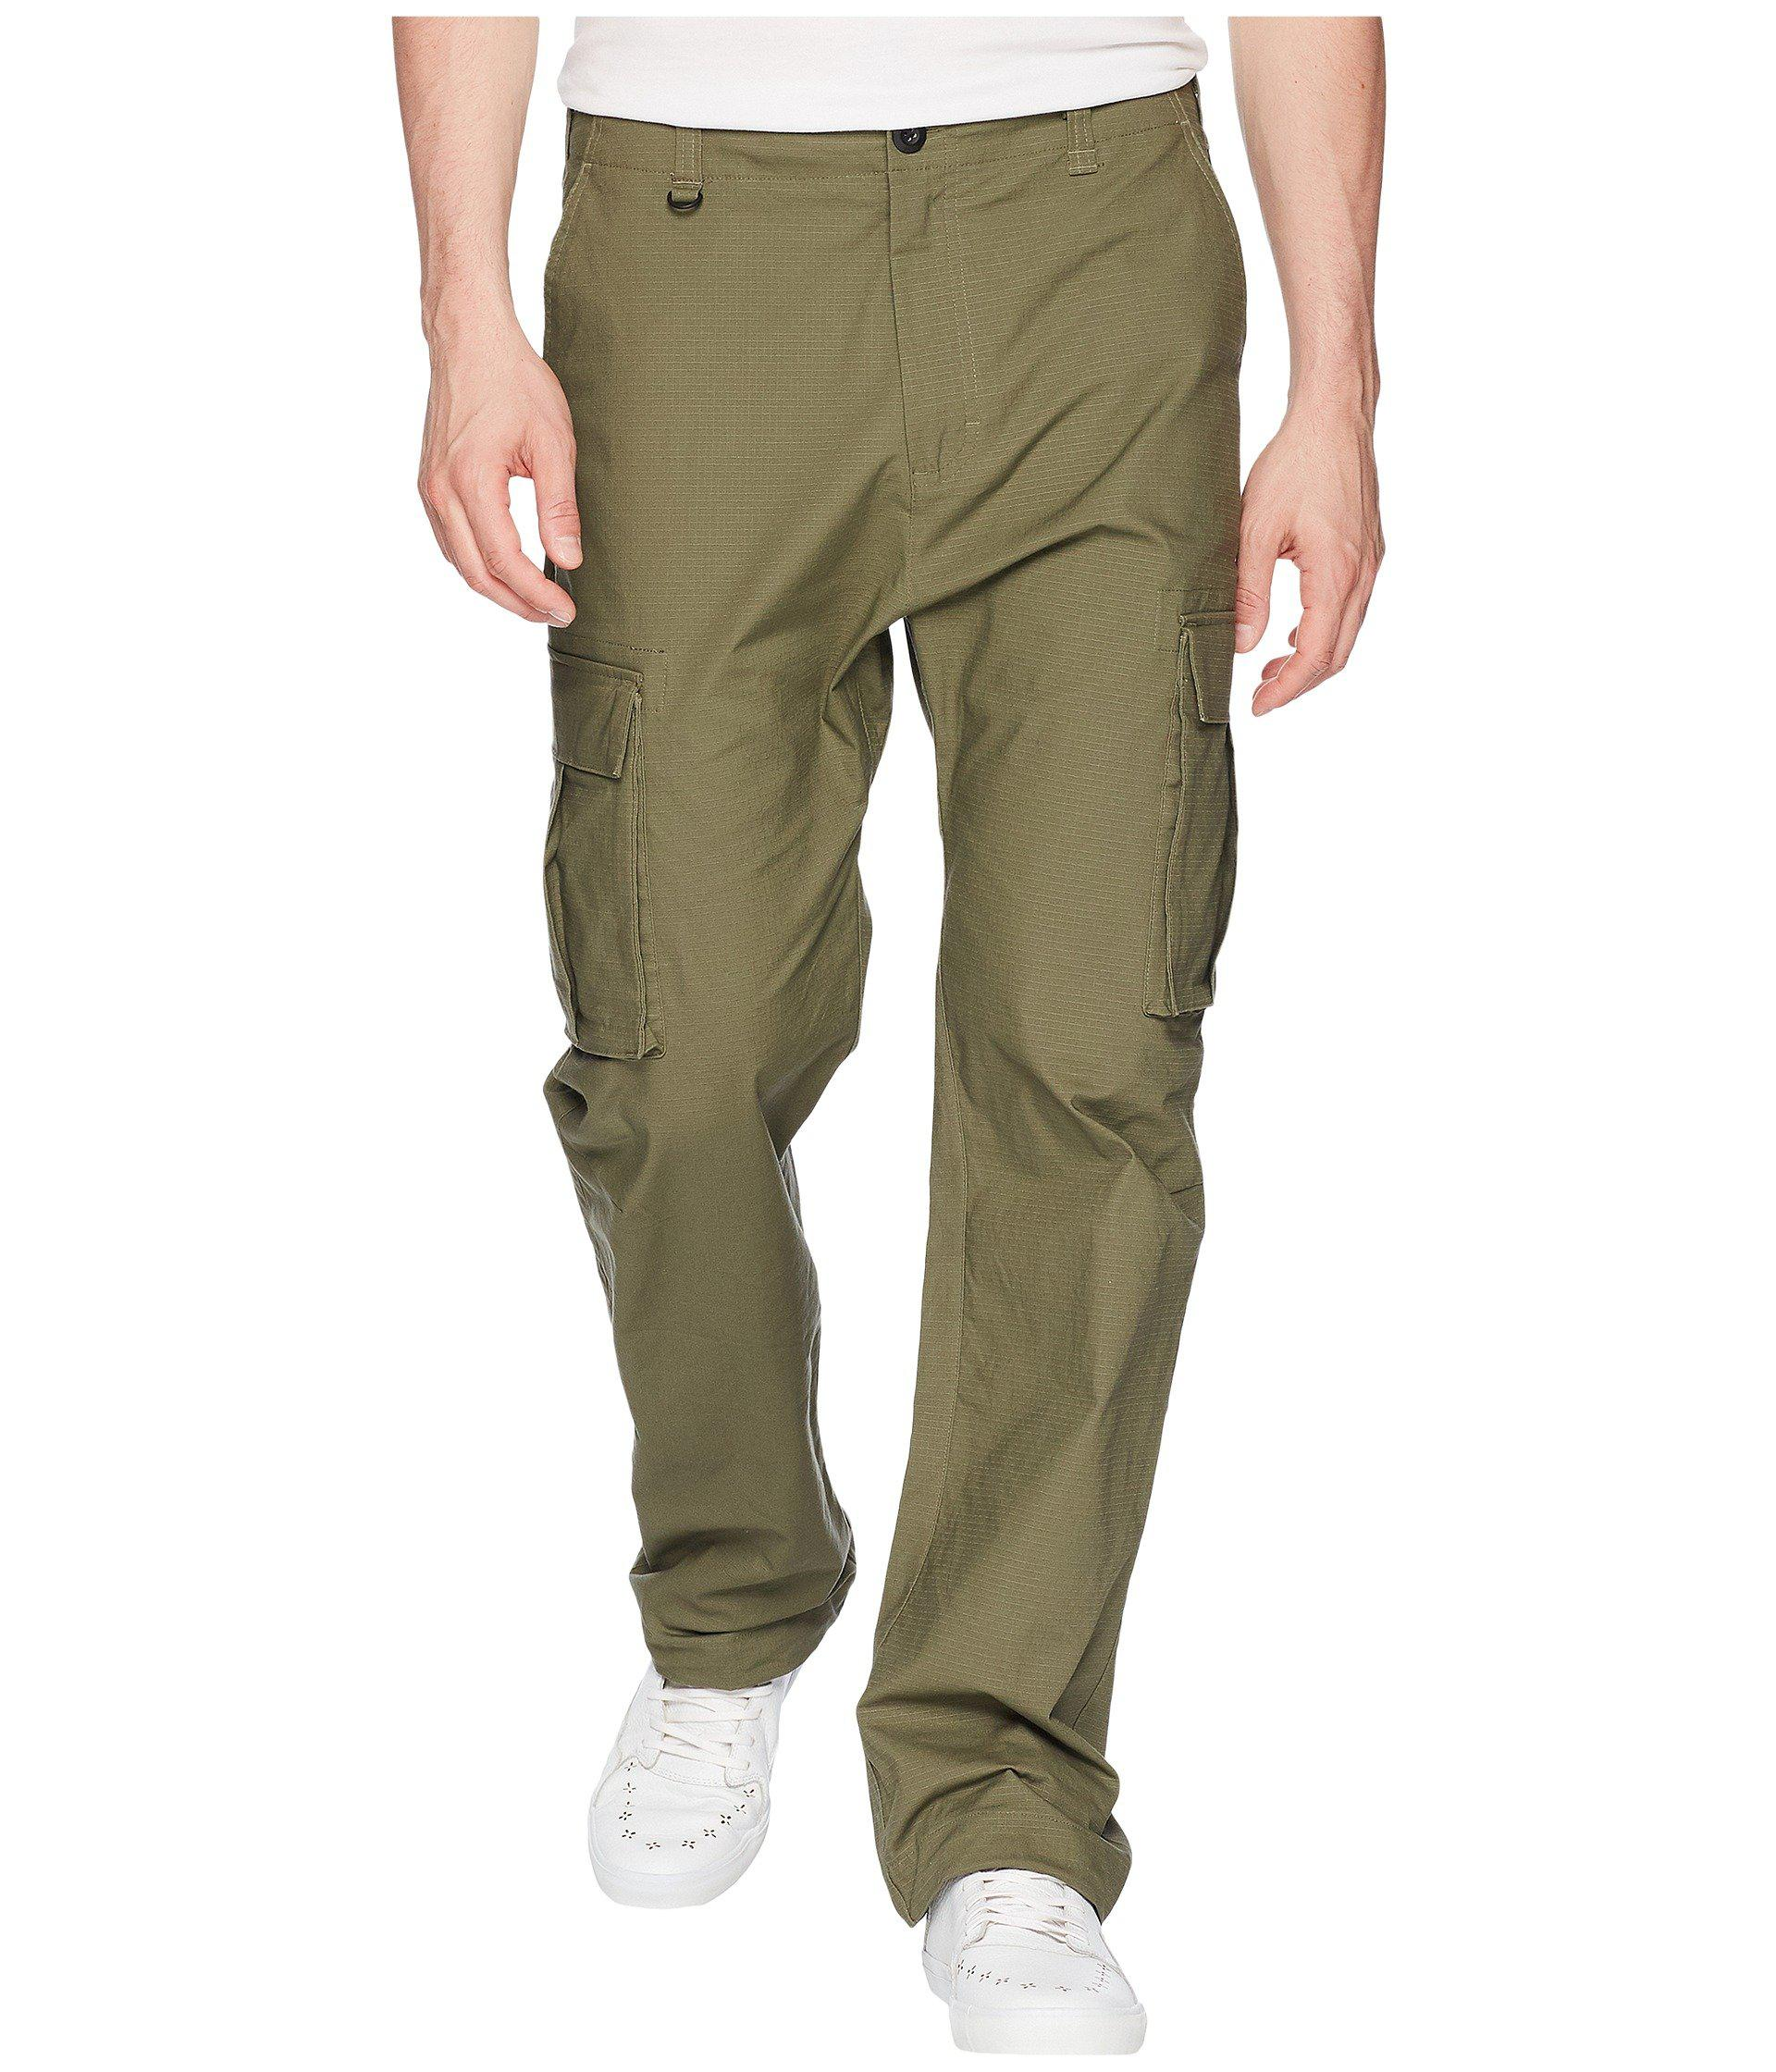 15f71f2277ab Lyst - Nike Sb Flex Pants Fit To Move Cargo (medium Olive) Men s ...